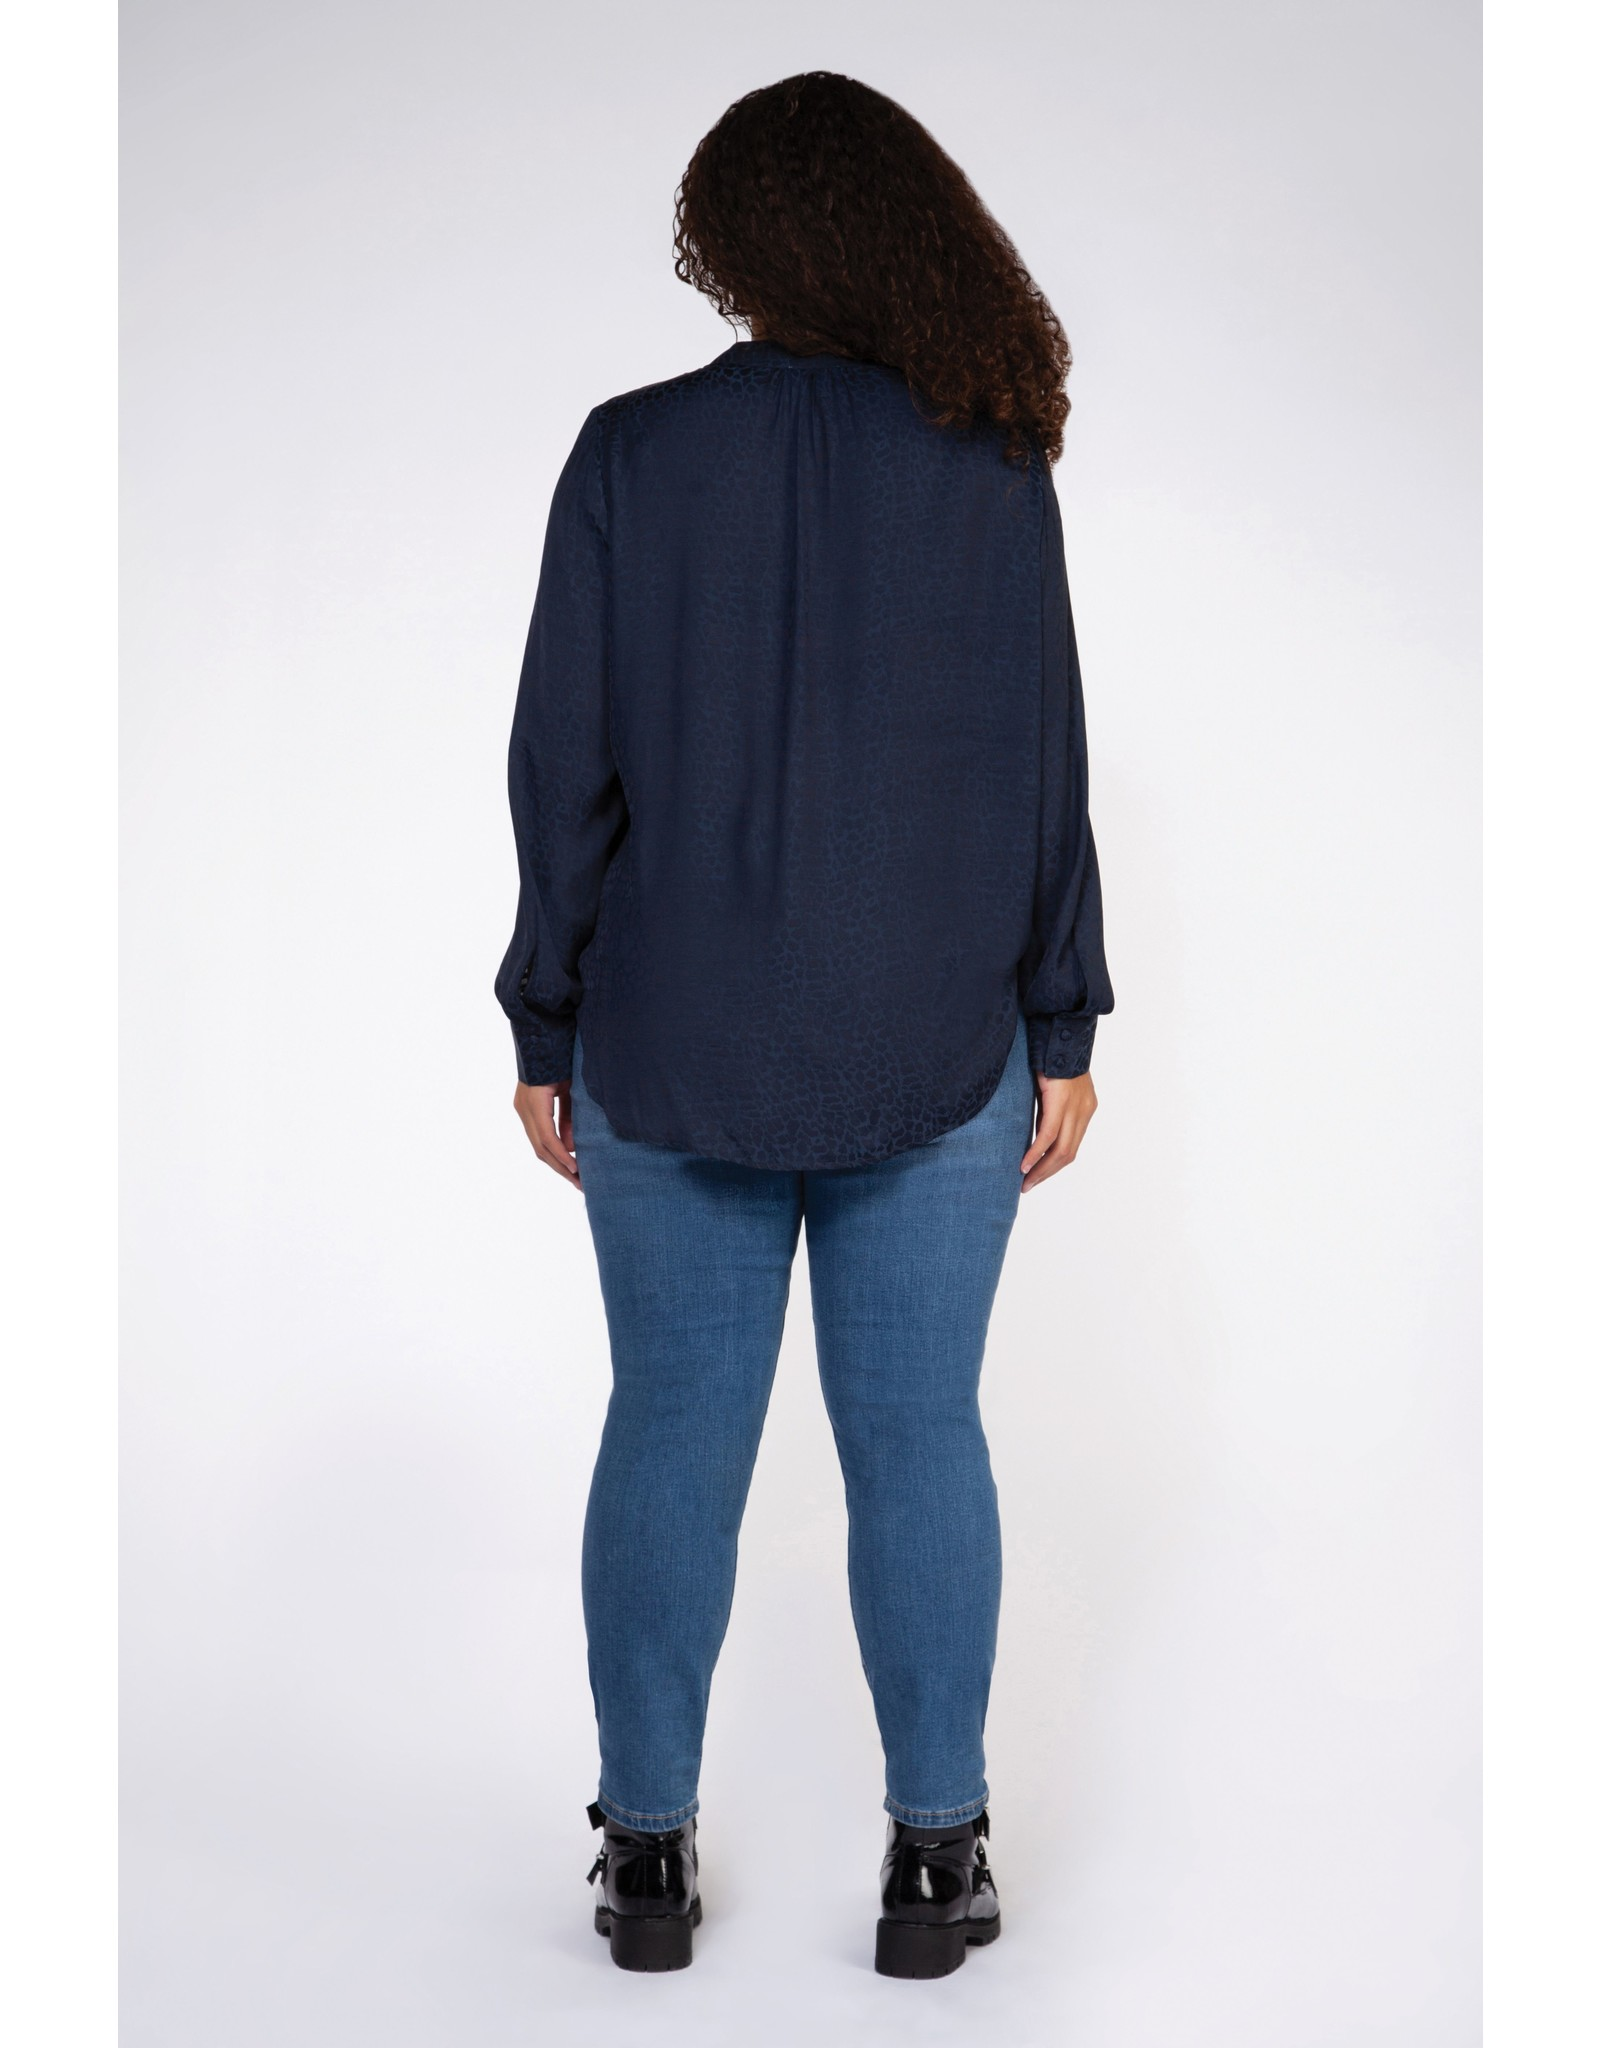 Dex Plus Pullover V-Neck Blouse